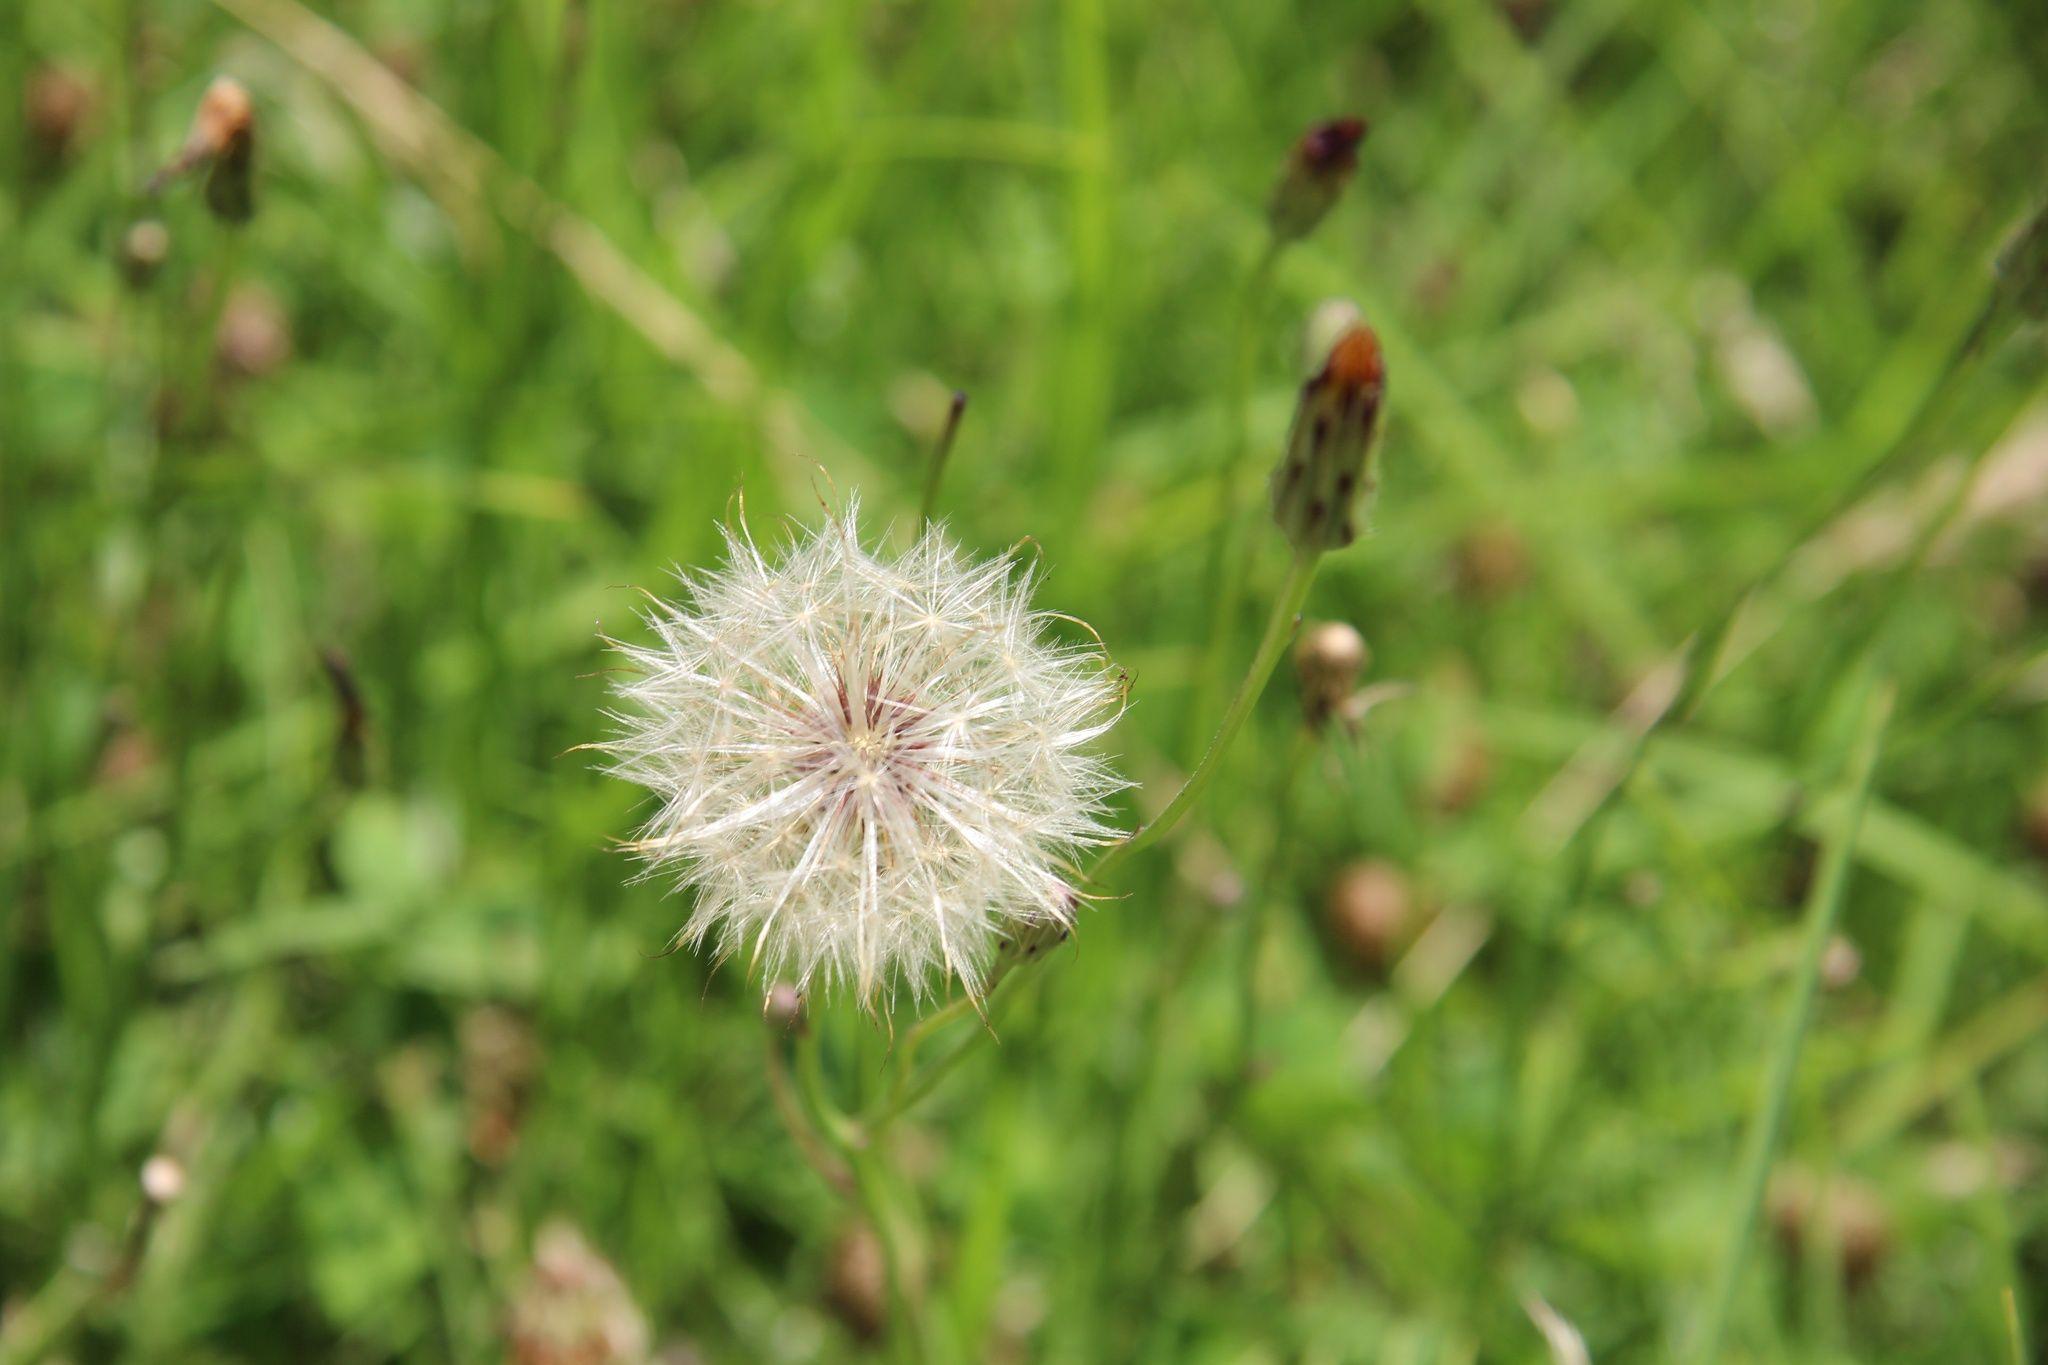 Seed Flower by Charissa Lotter (de Scande) by Charissa Lotter (de Scande) on 500px